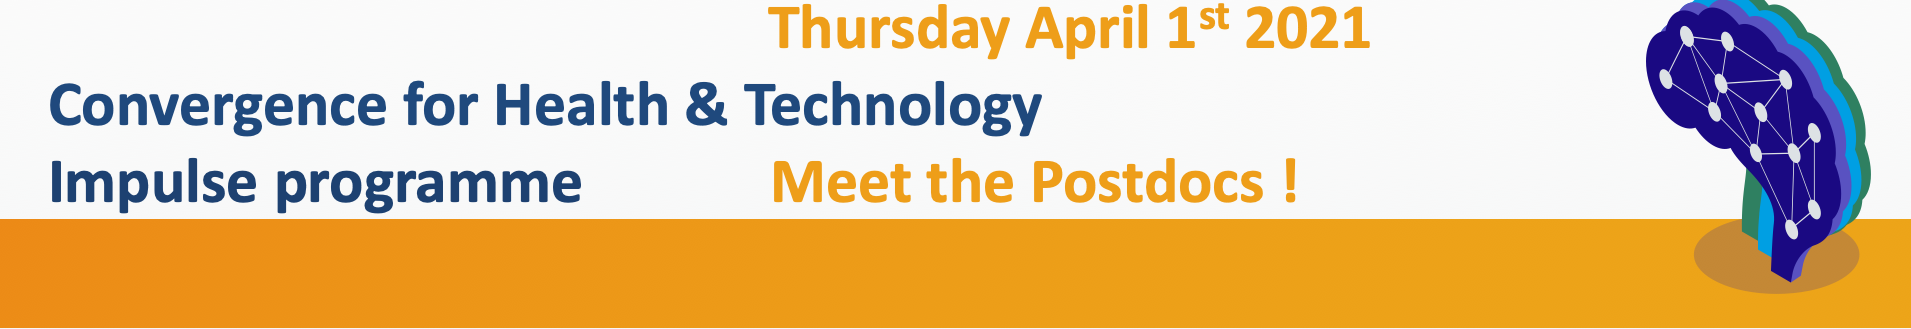 Meet the Postdocs | Convergence for Health & Technology